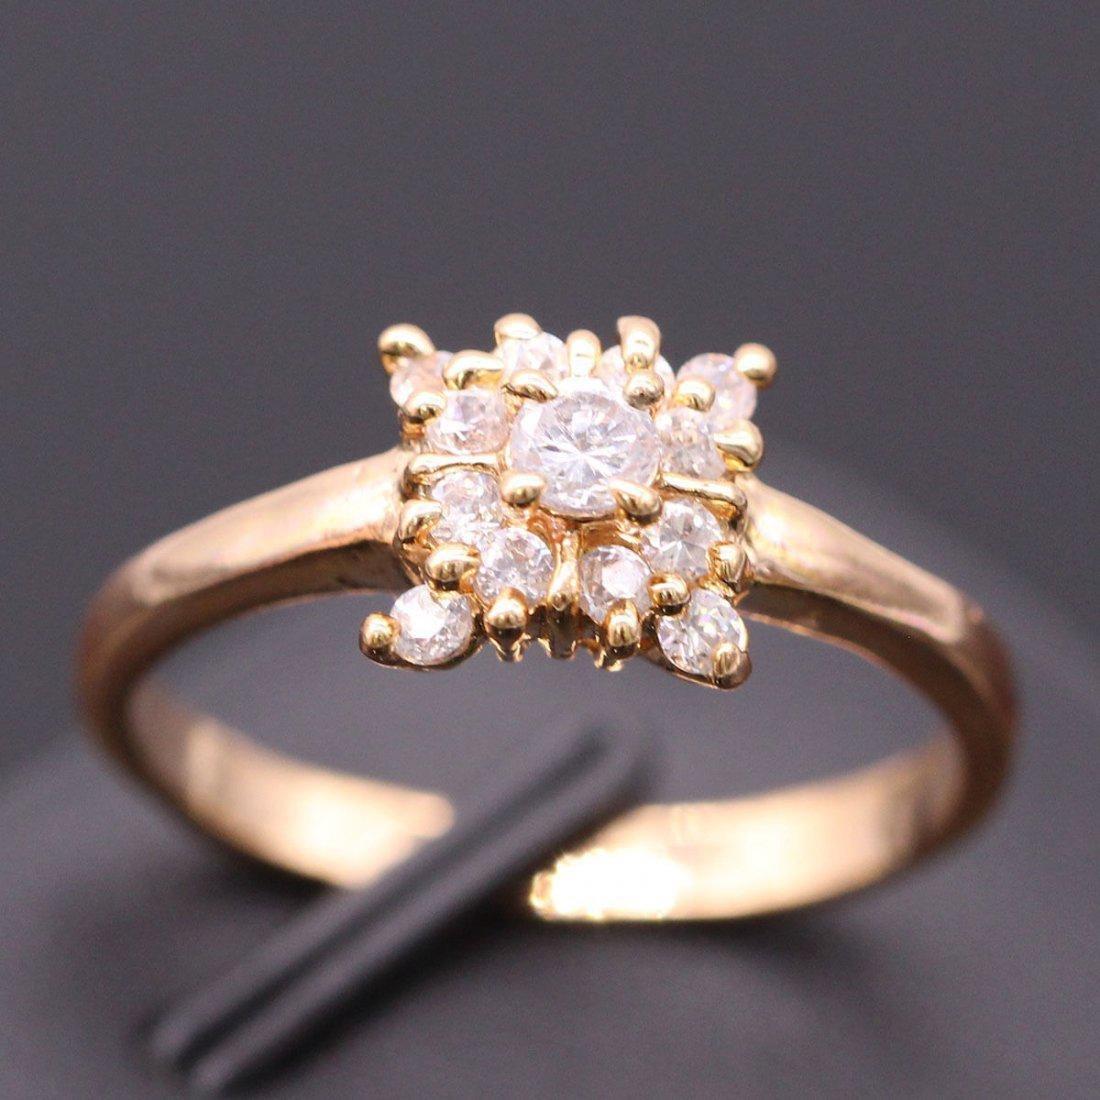 Square Women Ring White Crystal 24k GP Zircon Ring Size